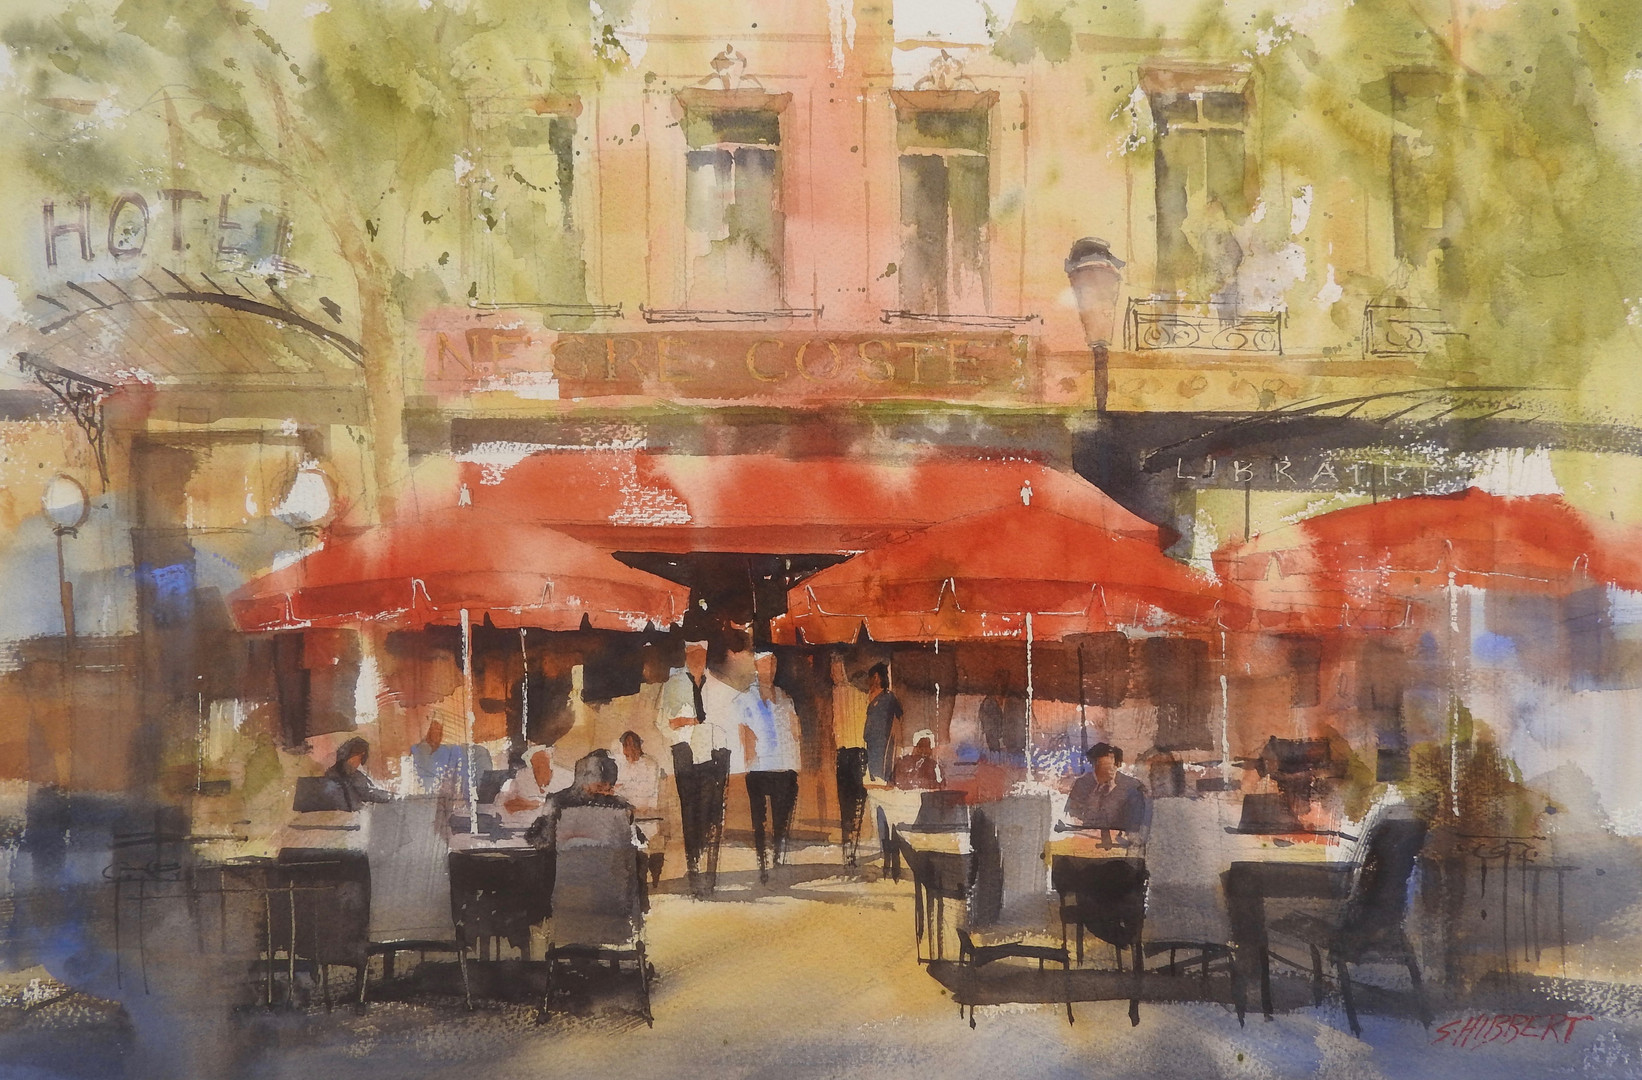 Cafe in Aix-en-Provence, sold